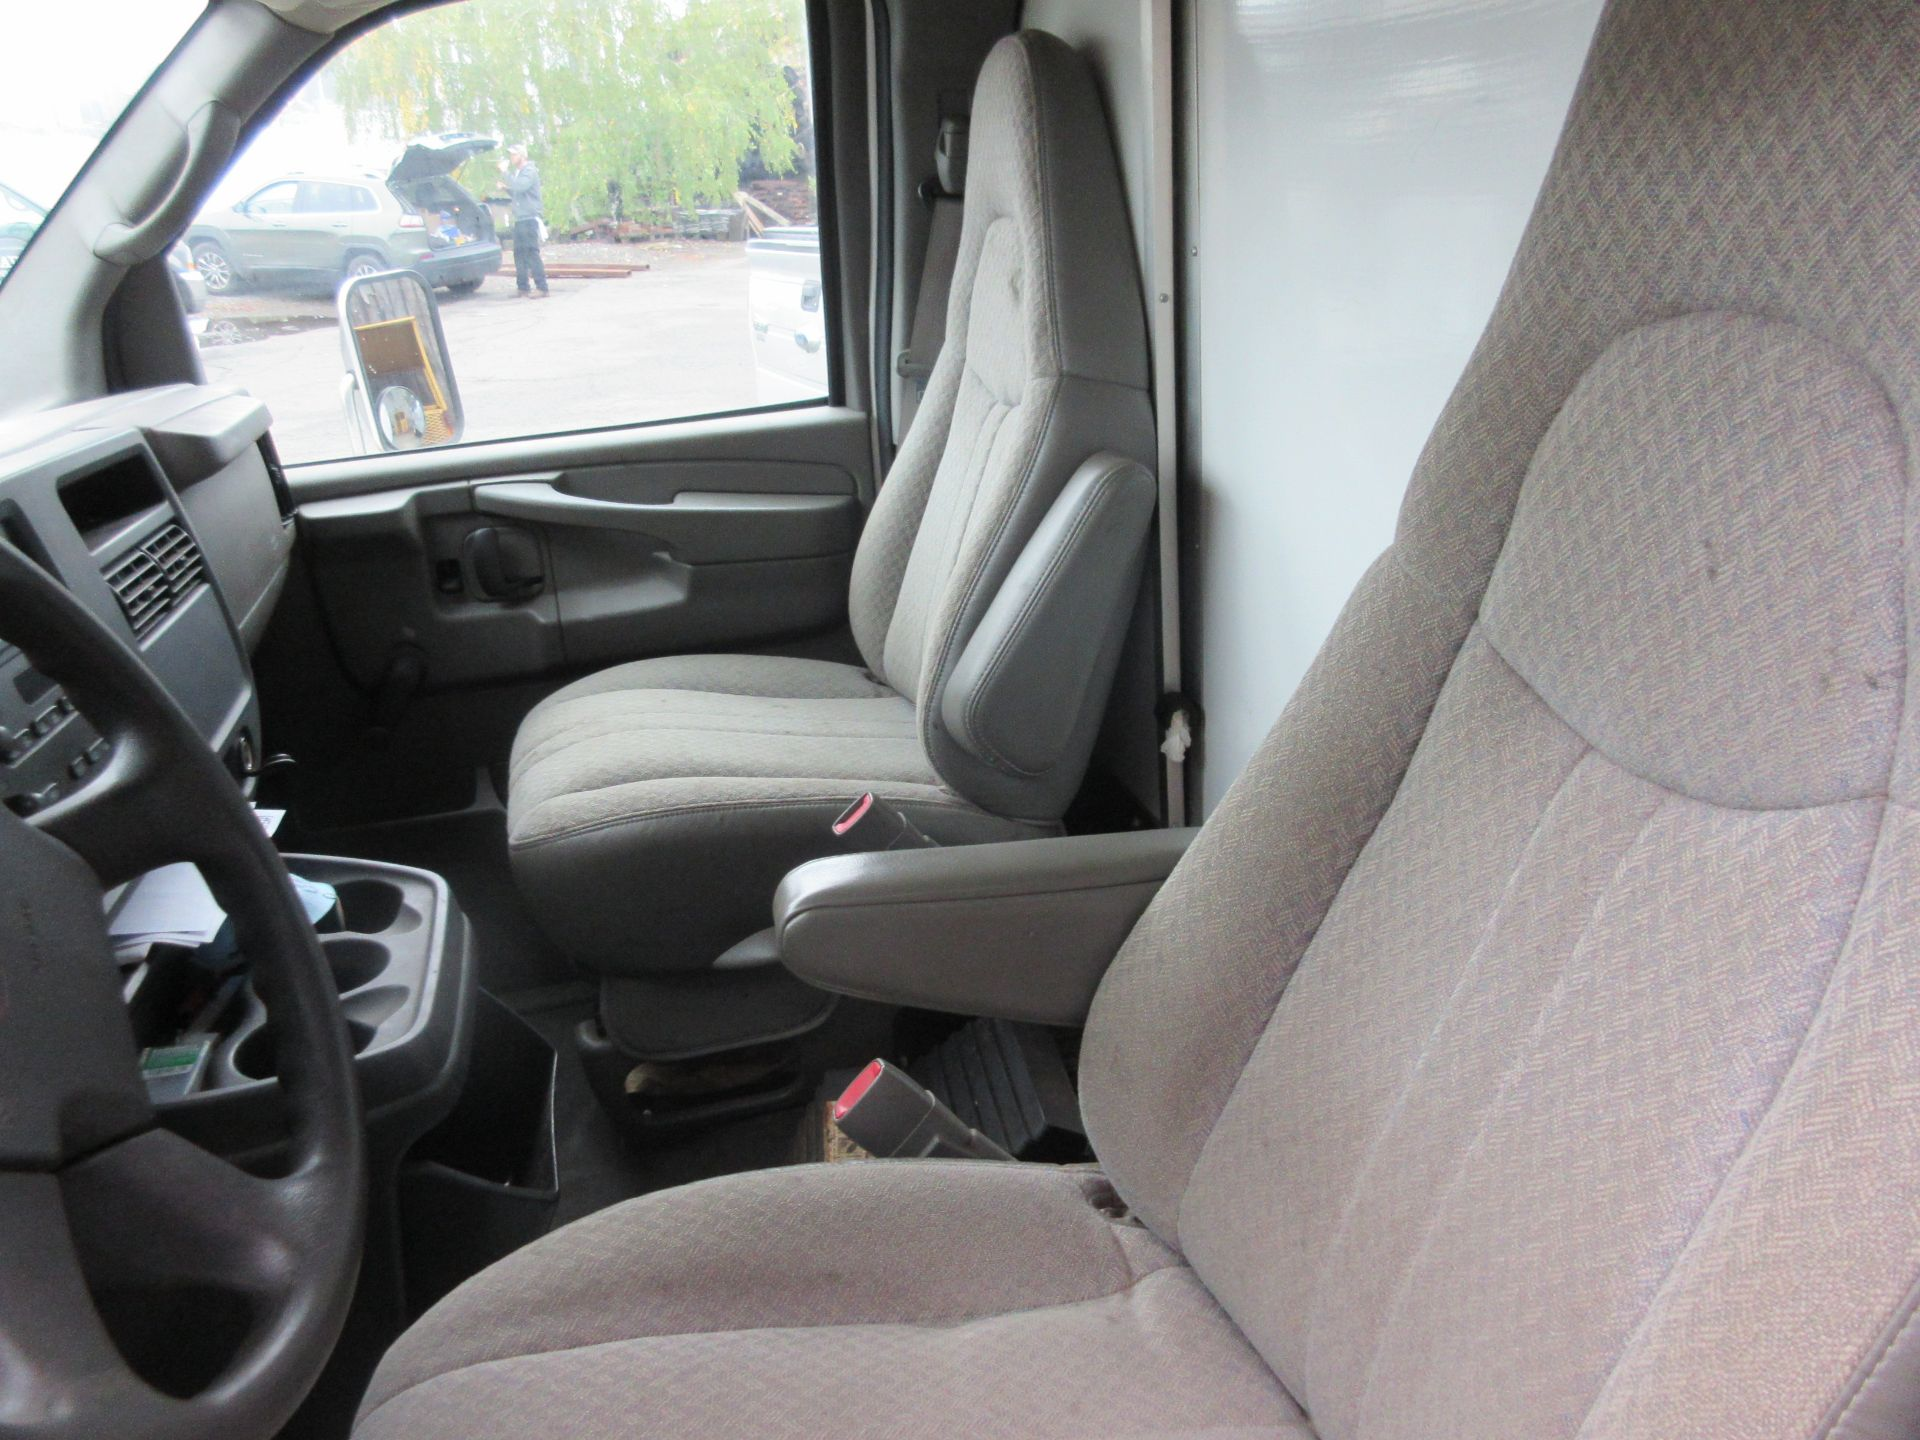 2004 GMC Savana 3500 Box Truck 2WD 8 Cylinders U 6.0L FI OHV 364 CID, VIN 1GDHG31U841236876 - Image 6 of 7